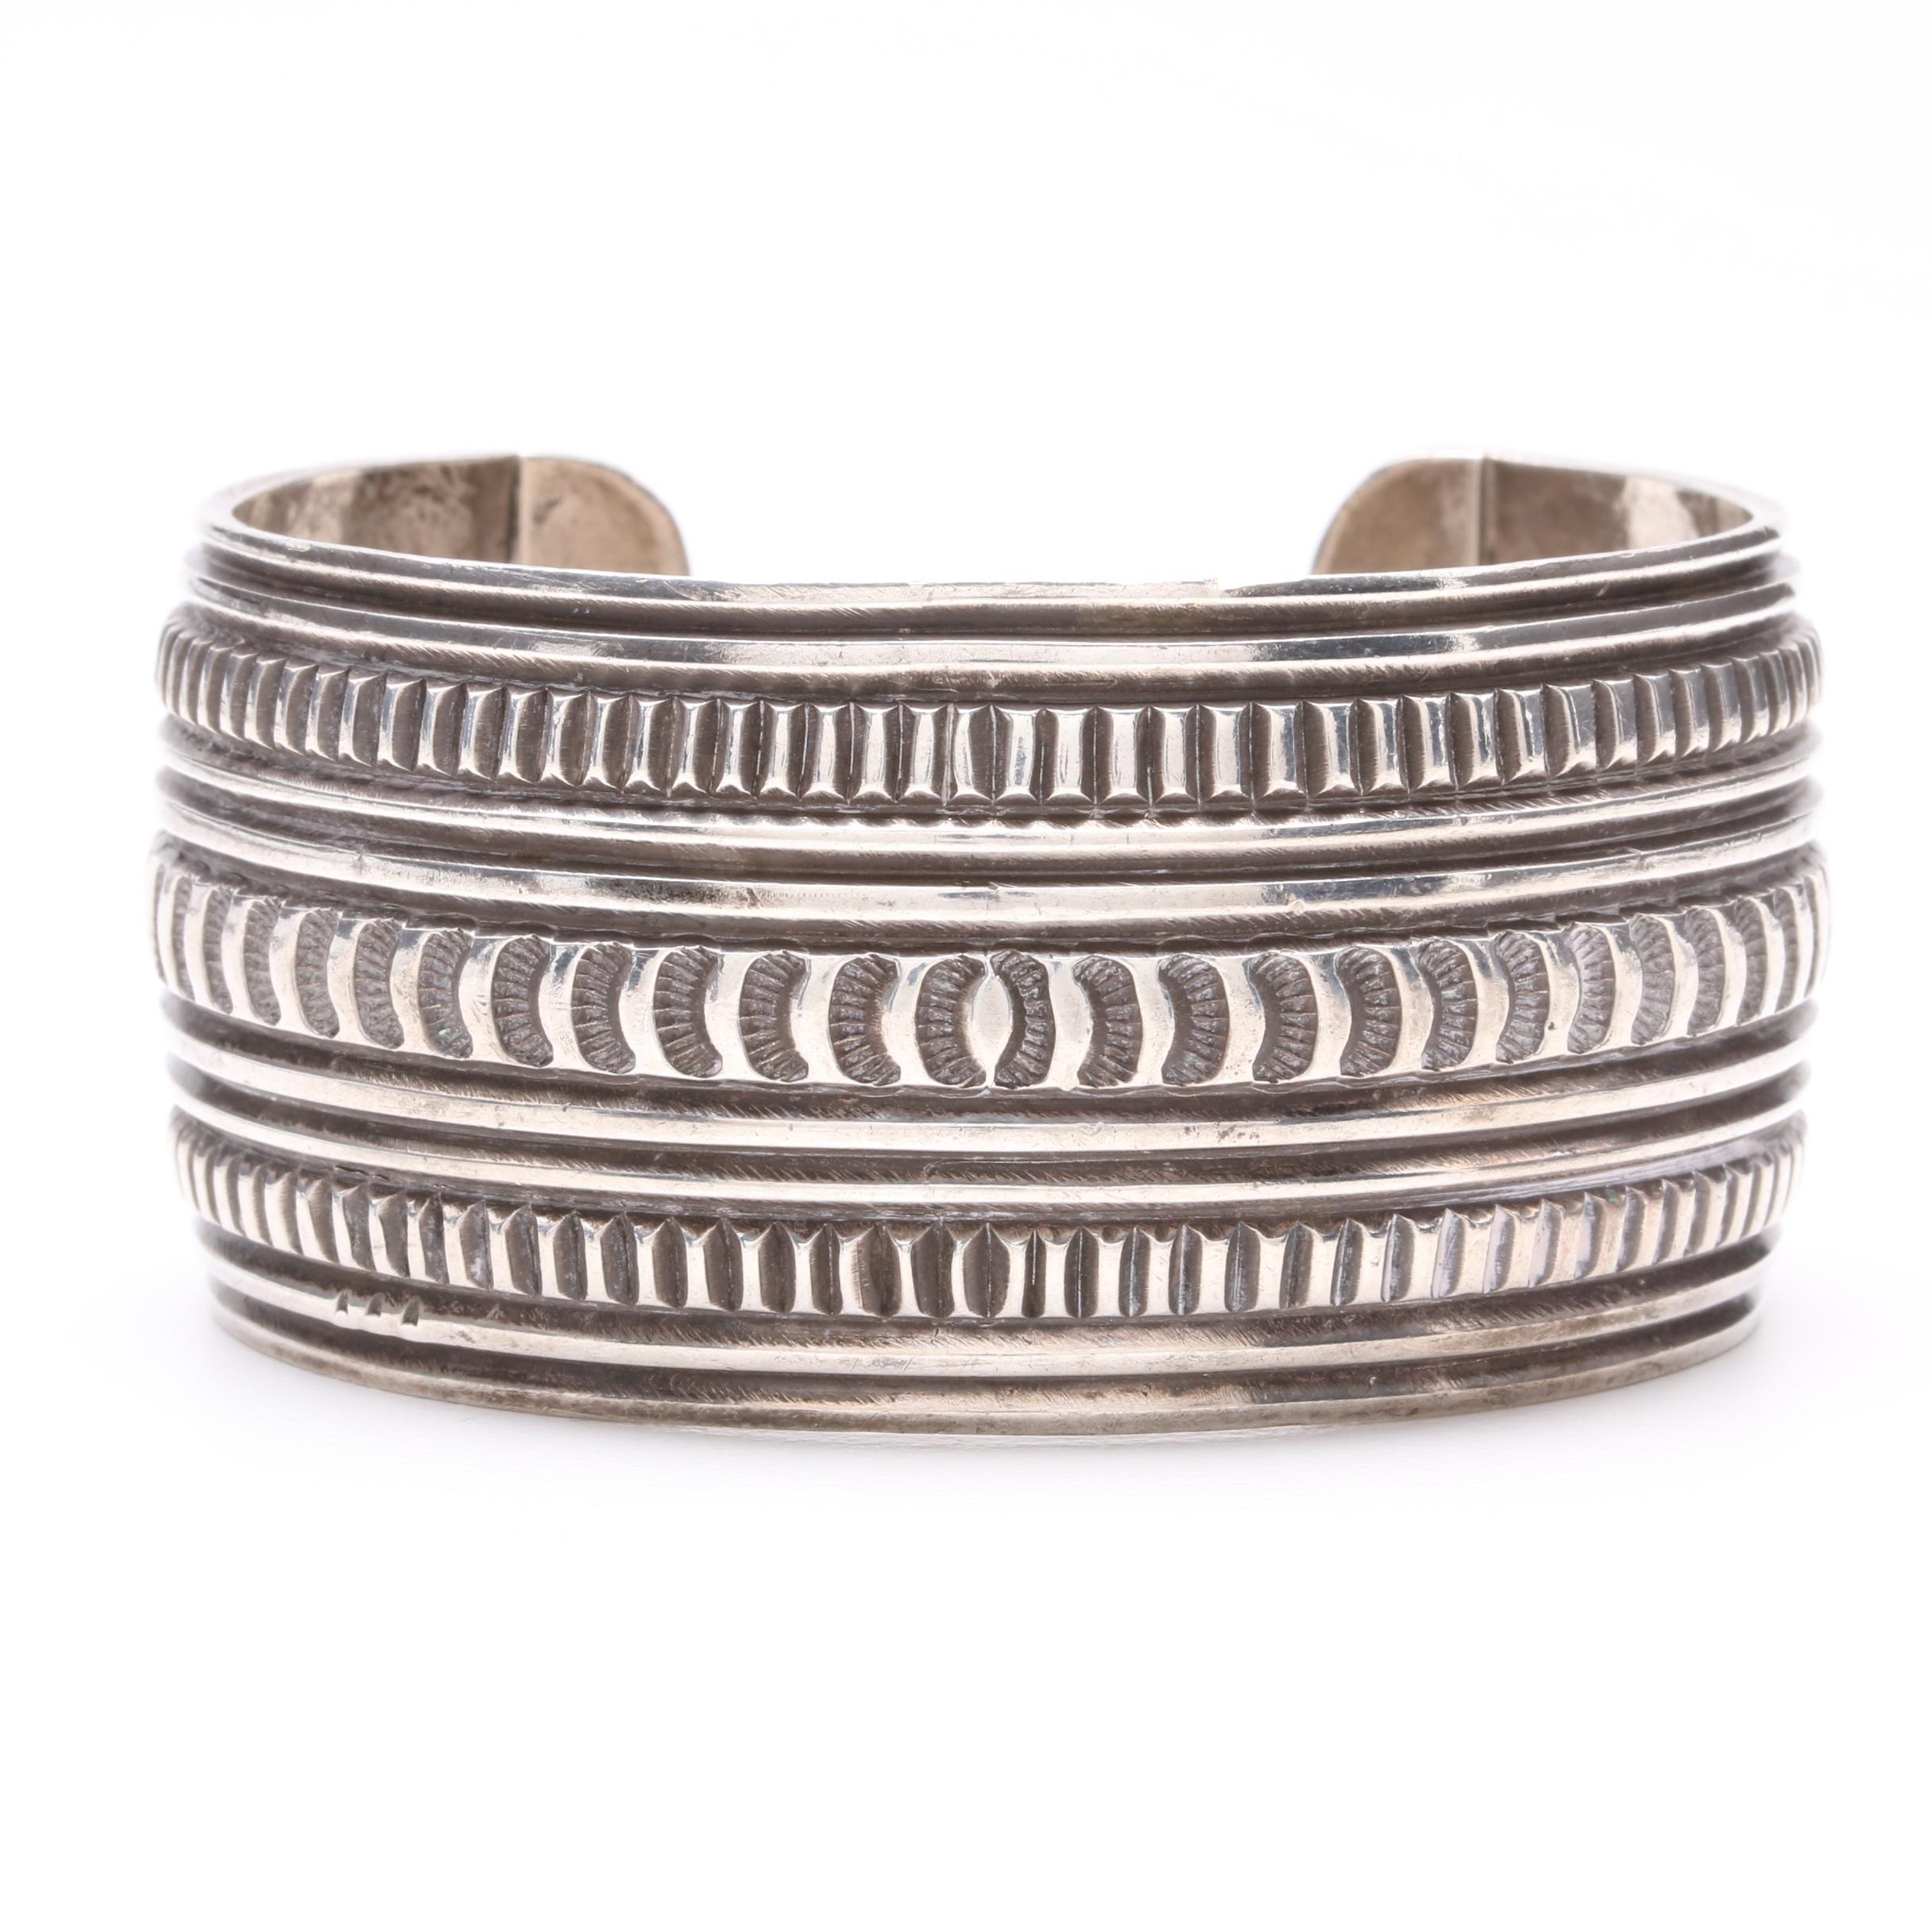 Sunshine Reeves Navajo Diné Sterling Silver Cuff Bracelet